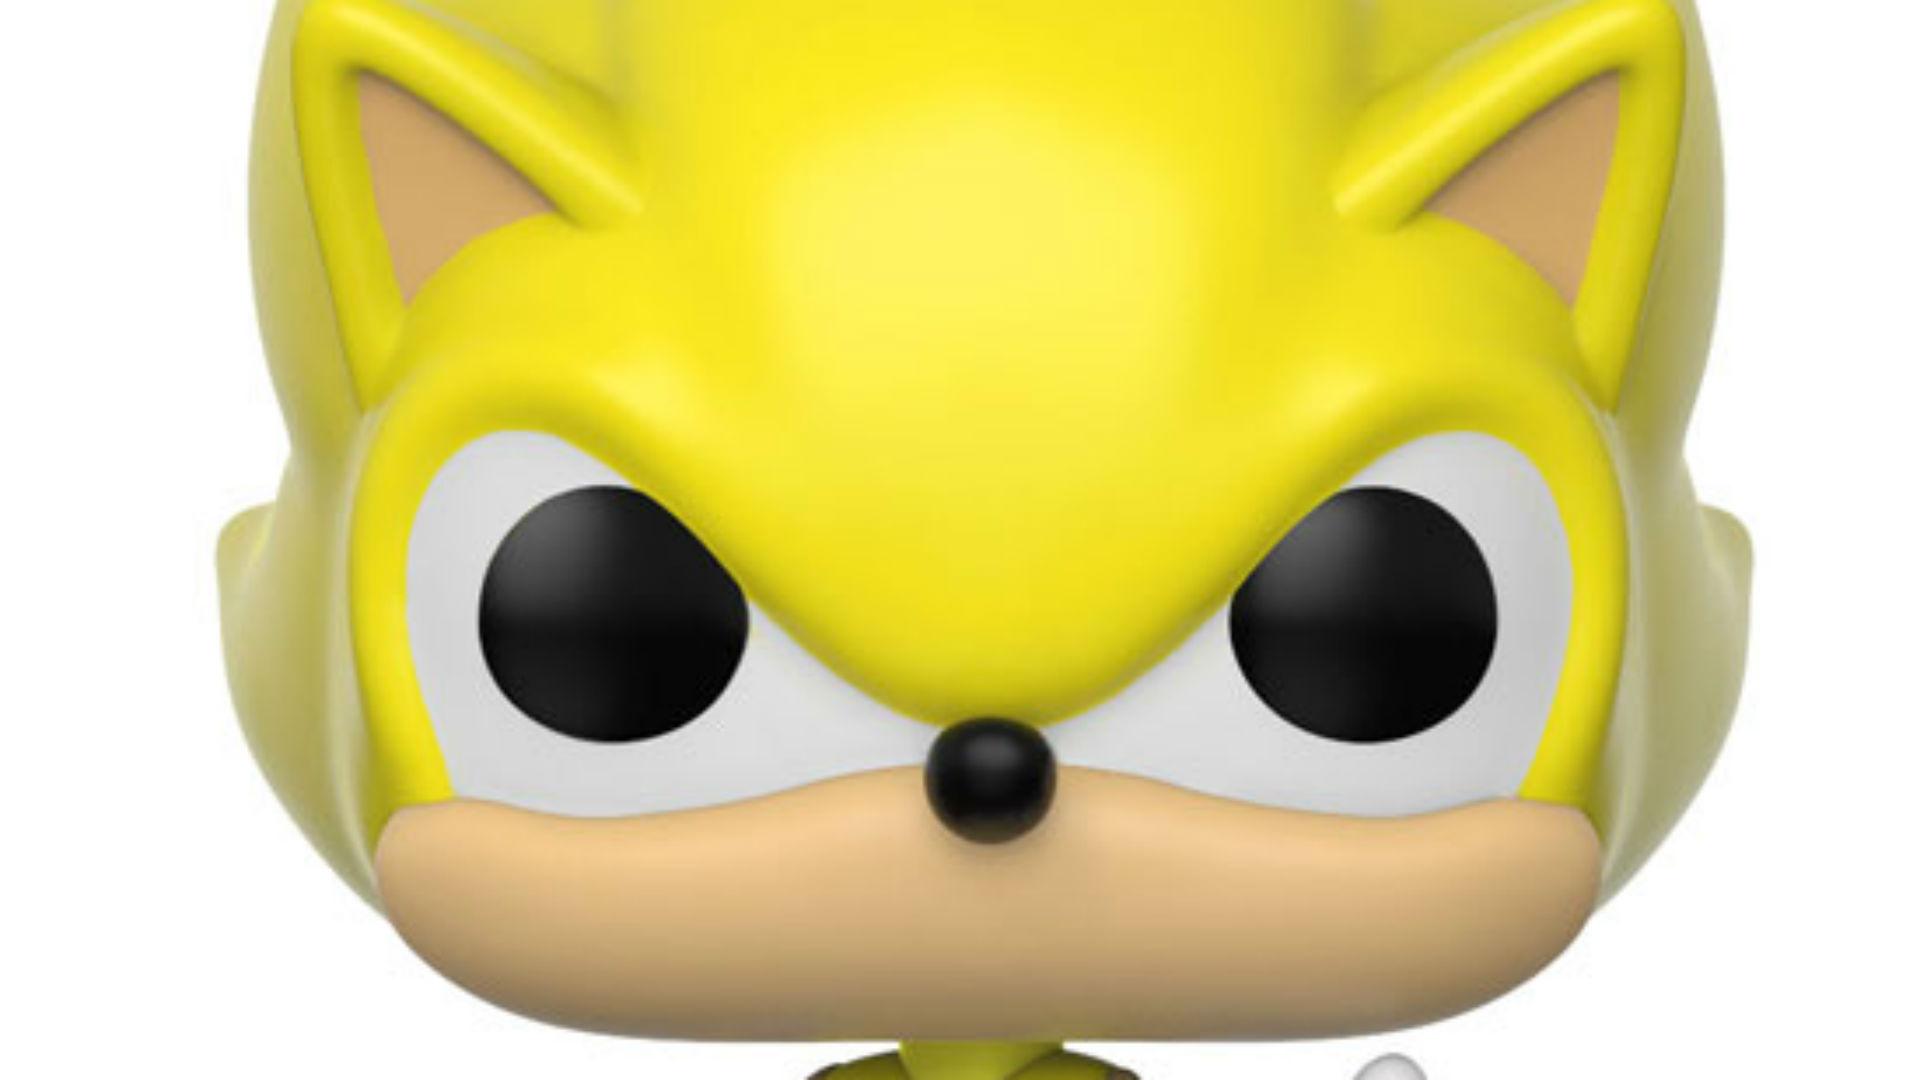 These Sonic Funko toys gotta go somewhere fast screenshot